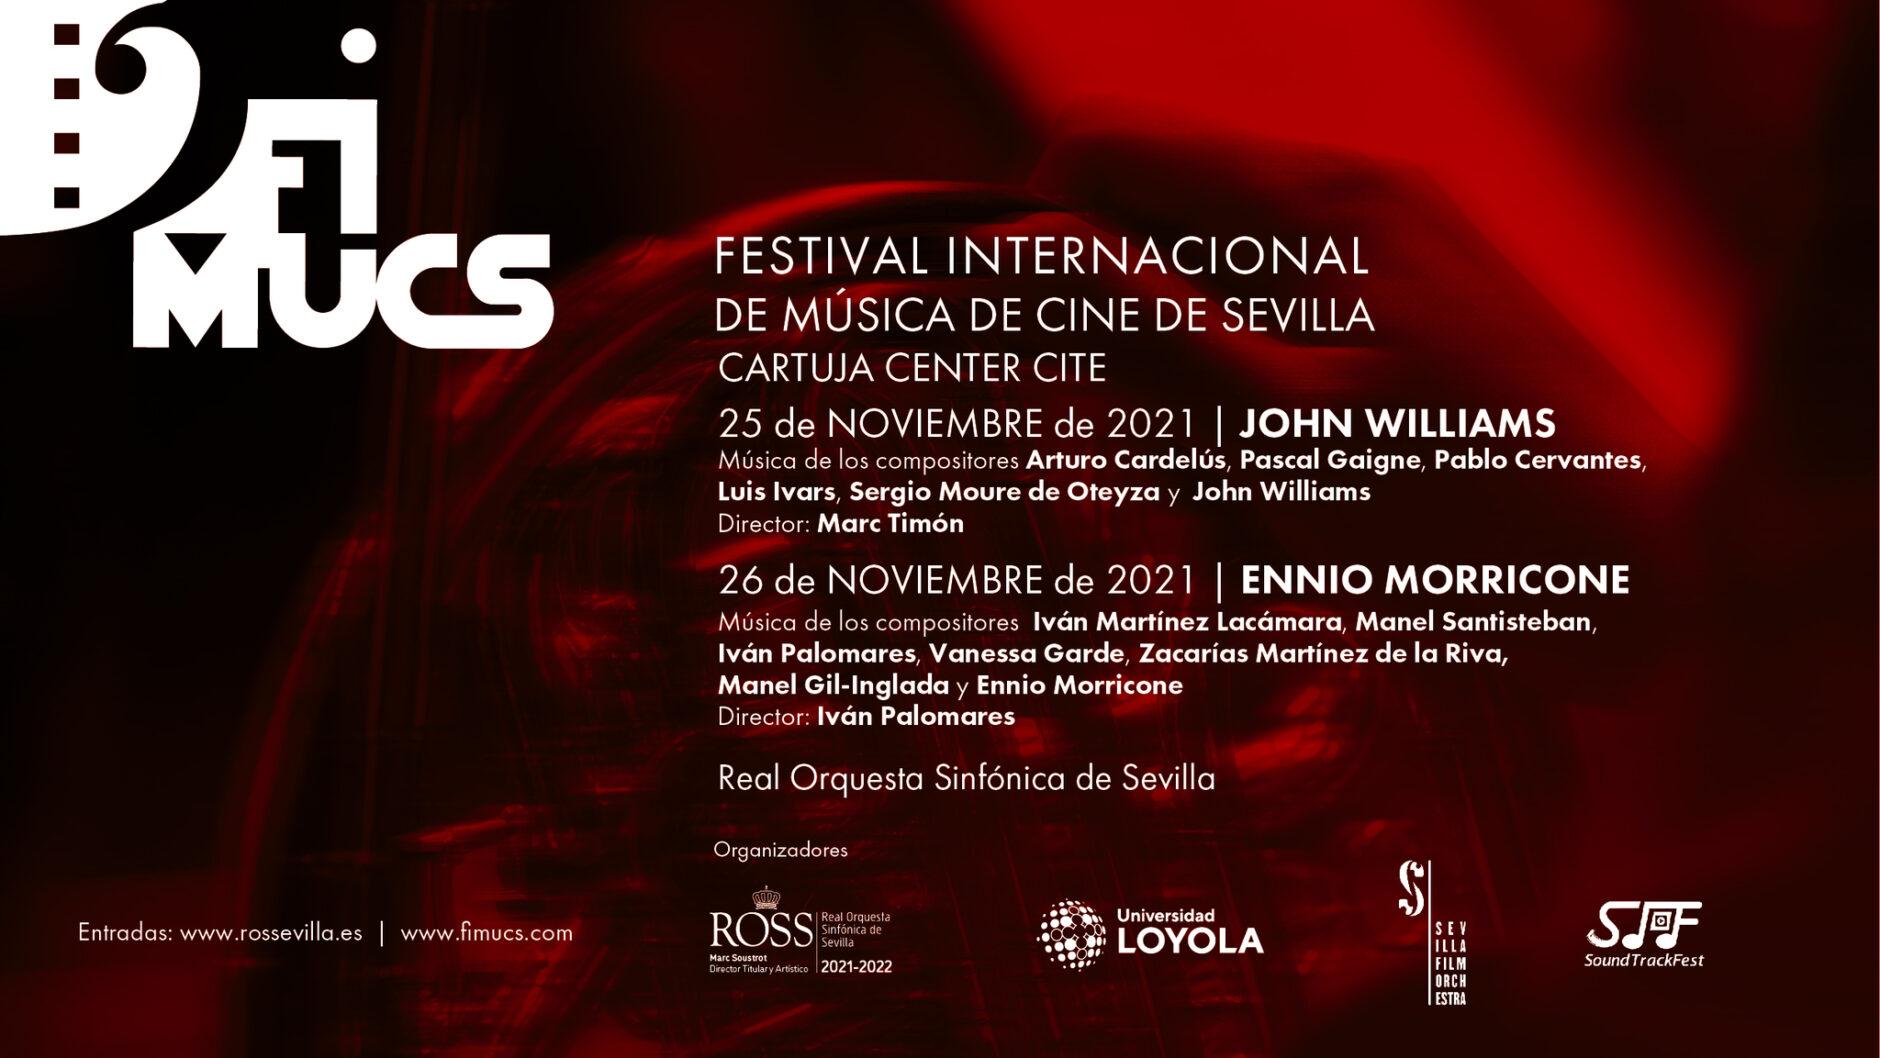 CARTUJA CENTER ACOGE EL I FESTIVAL INTERNACIONAL DE MÚSICA DE CINE DE SEVILLA 1